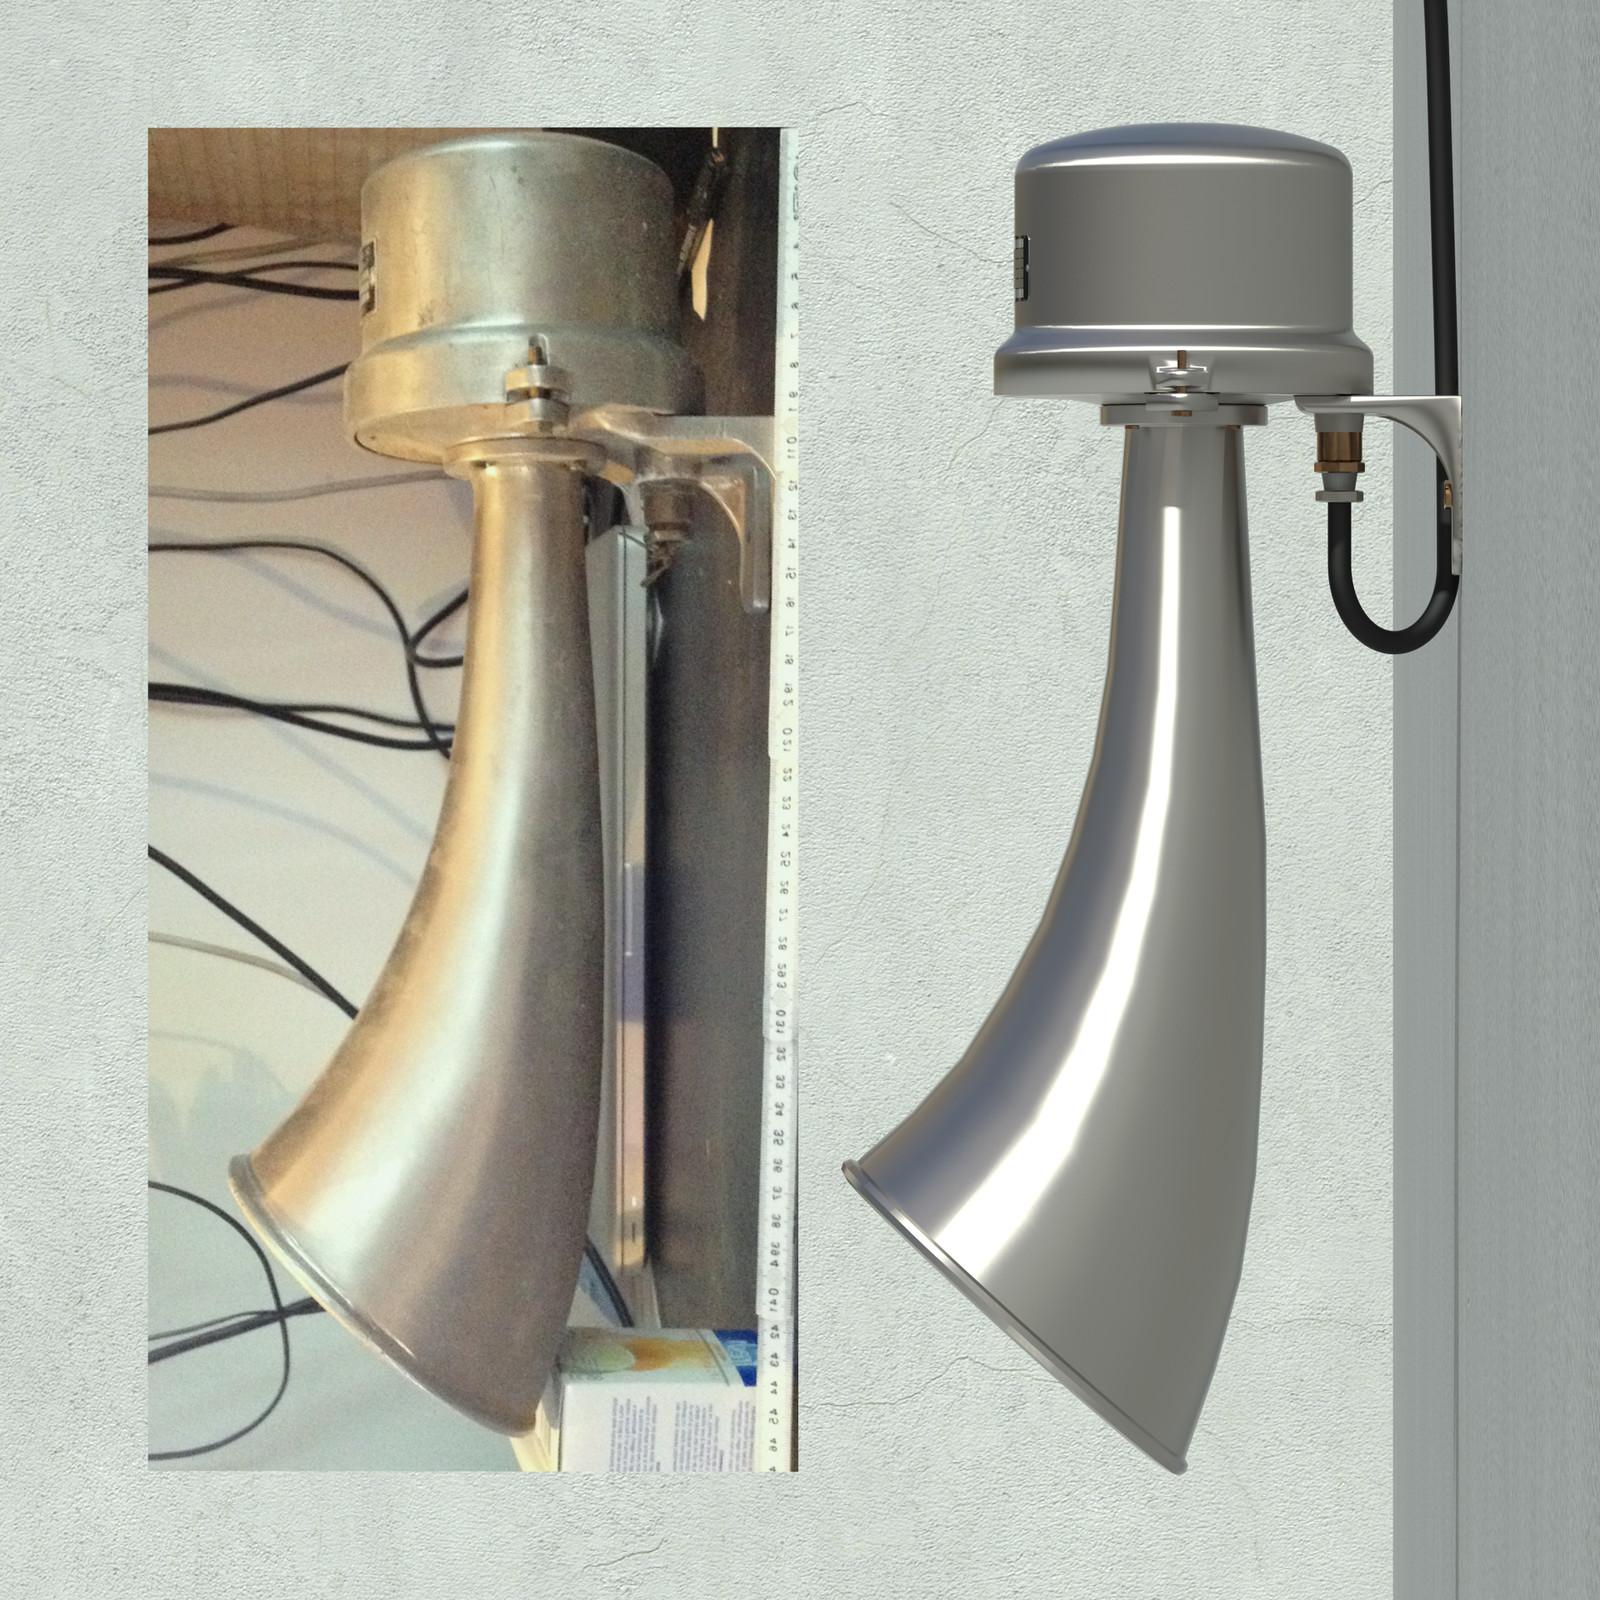 SketchUp + Thea Render  Rivendell Mill's Industrial Signal Warehouse Horns Rivendell Horns 01 Final Scene 02